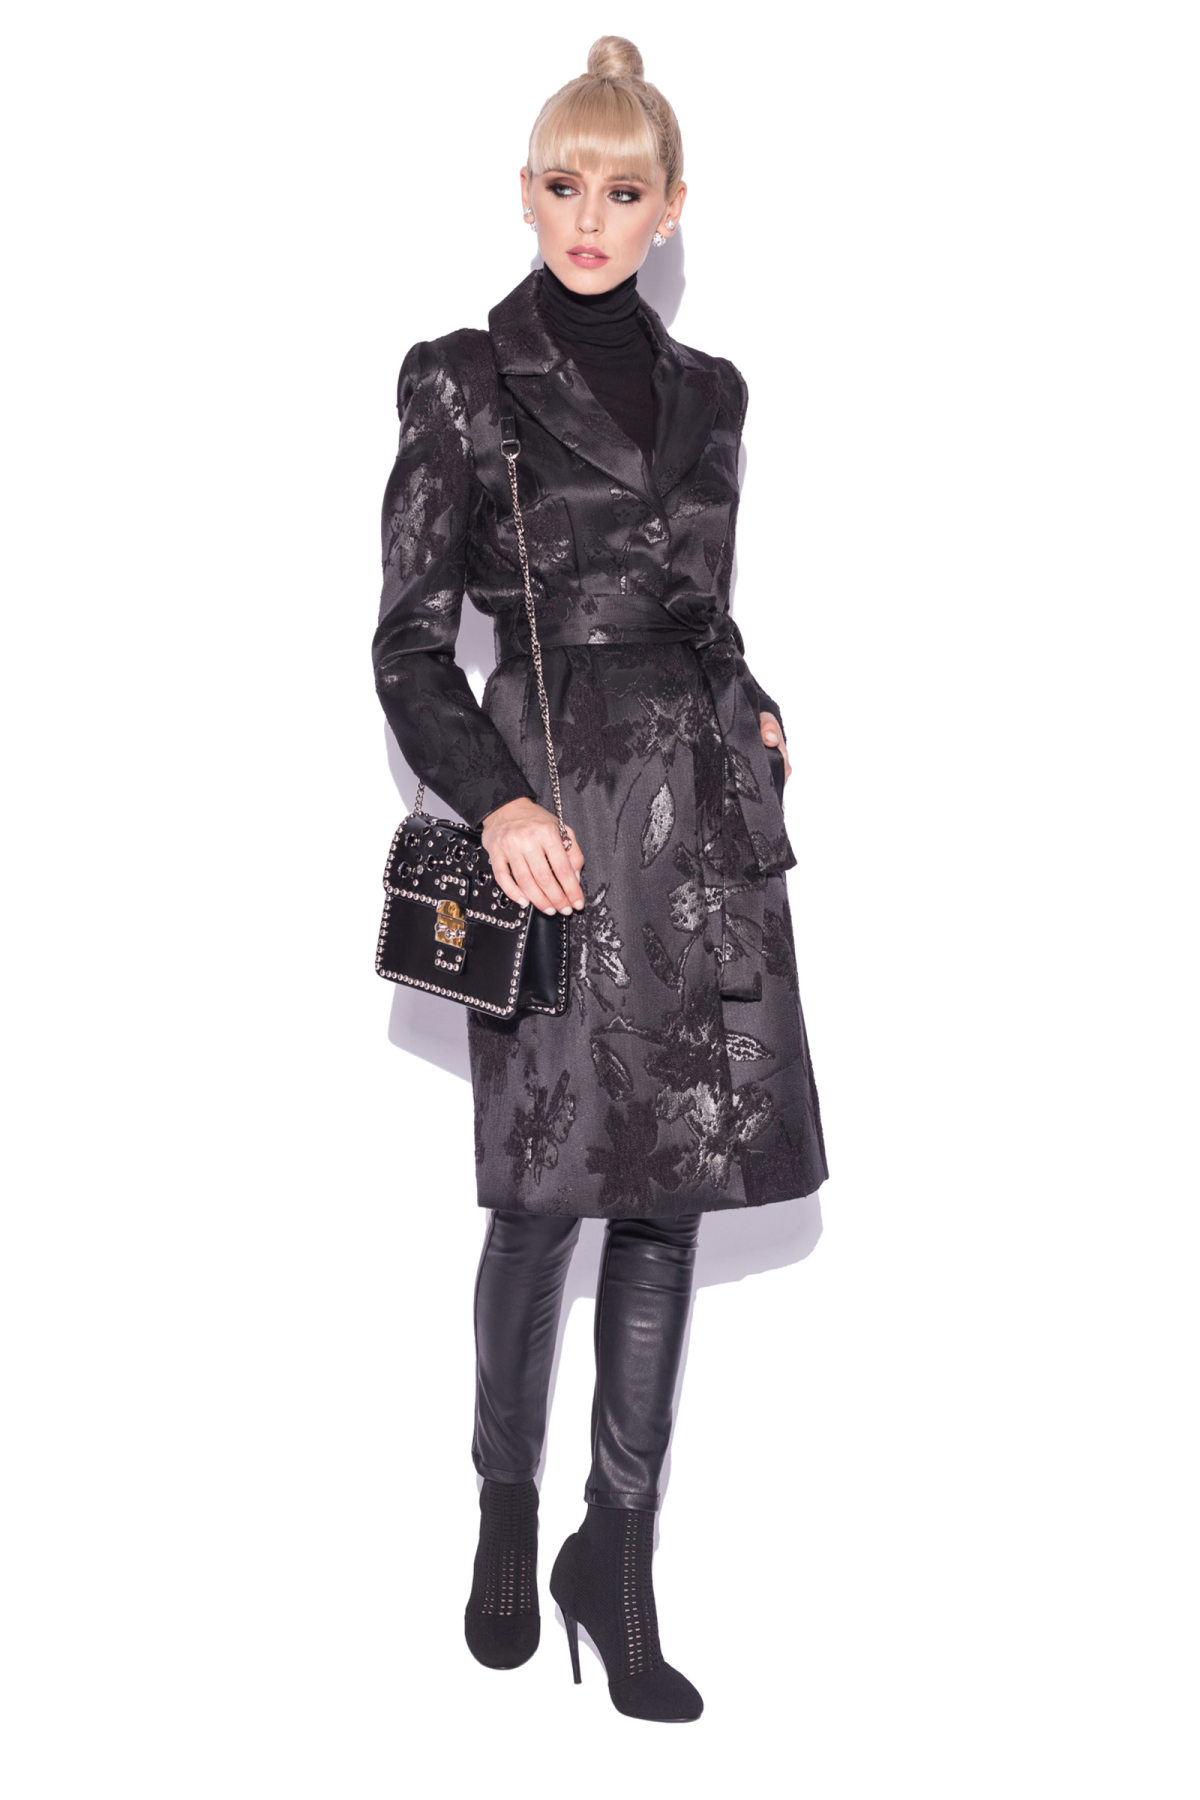 Palton elegant din brocart Negru